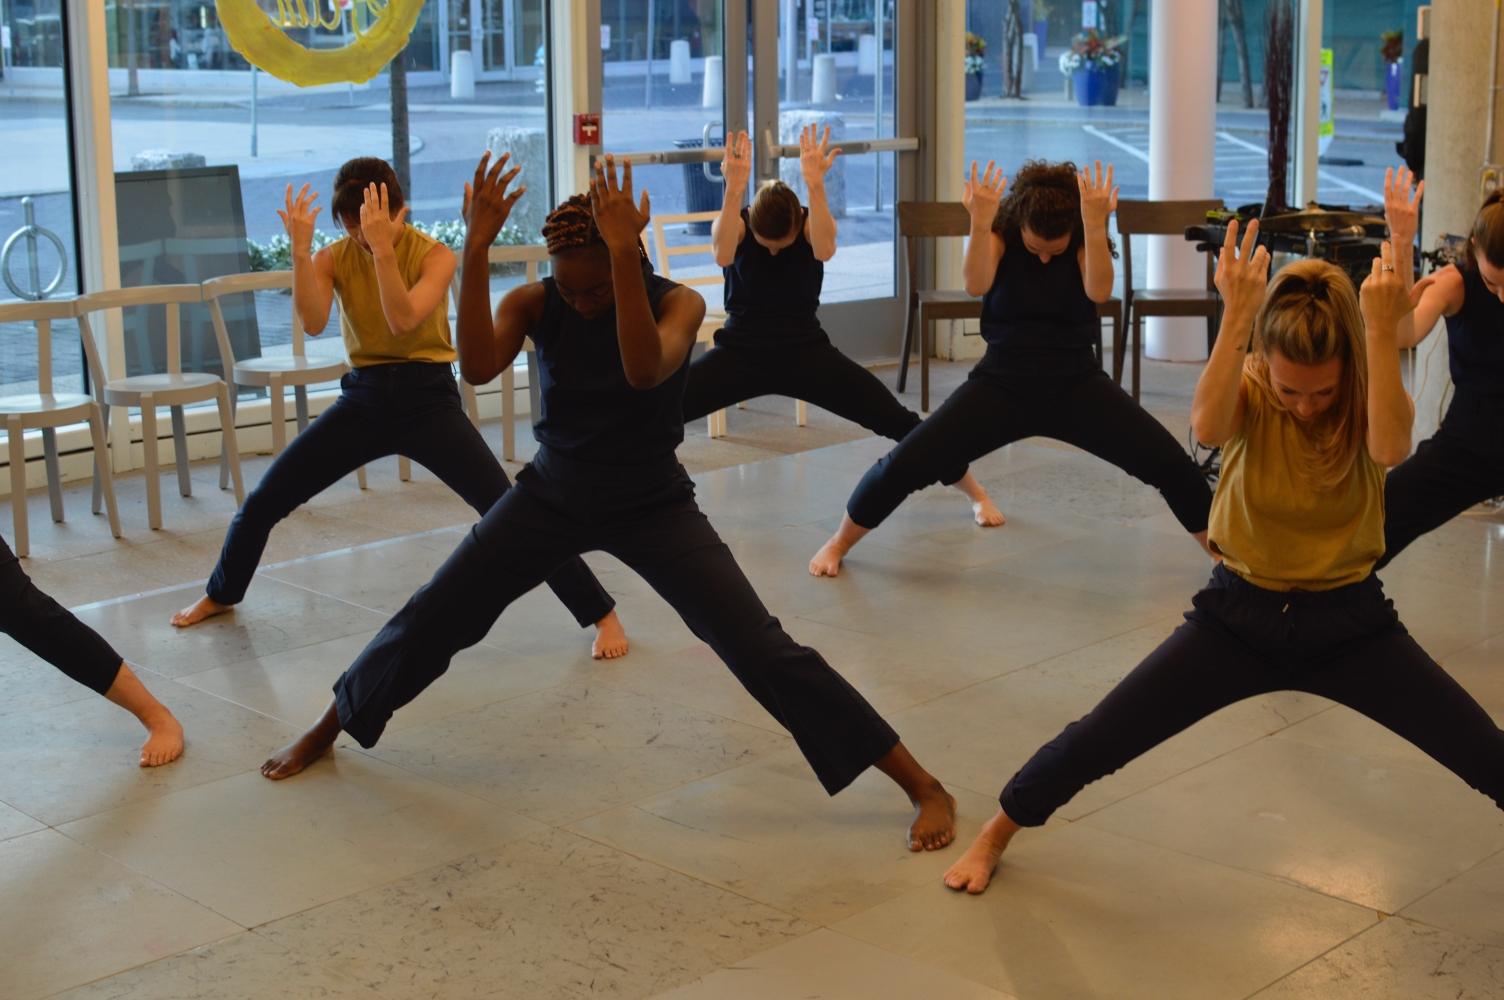 VLA DANCE residency at the K2 Community Space